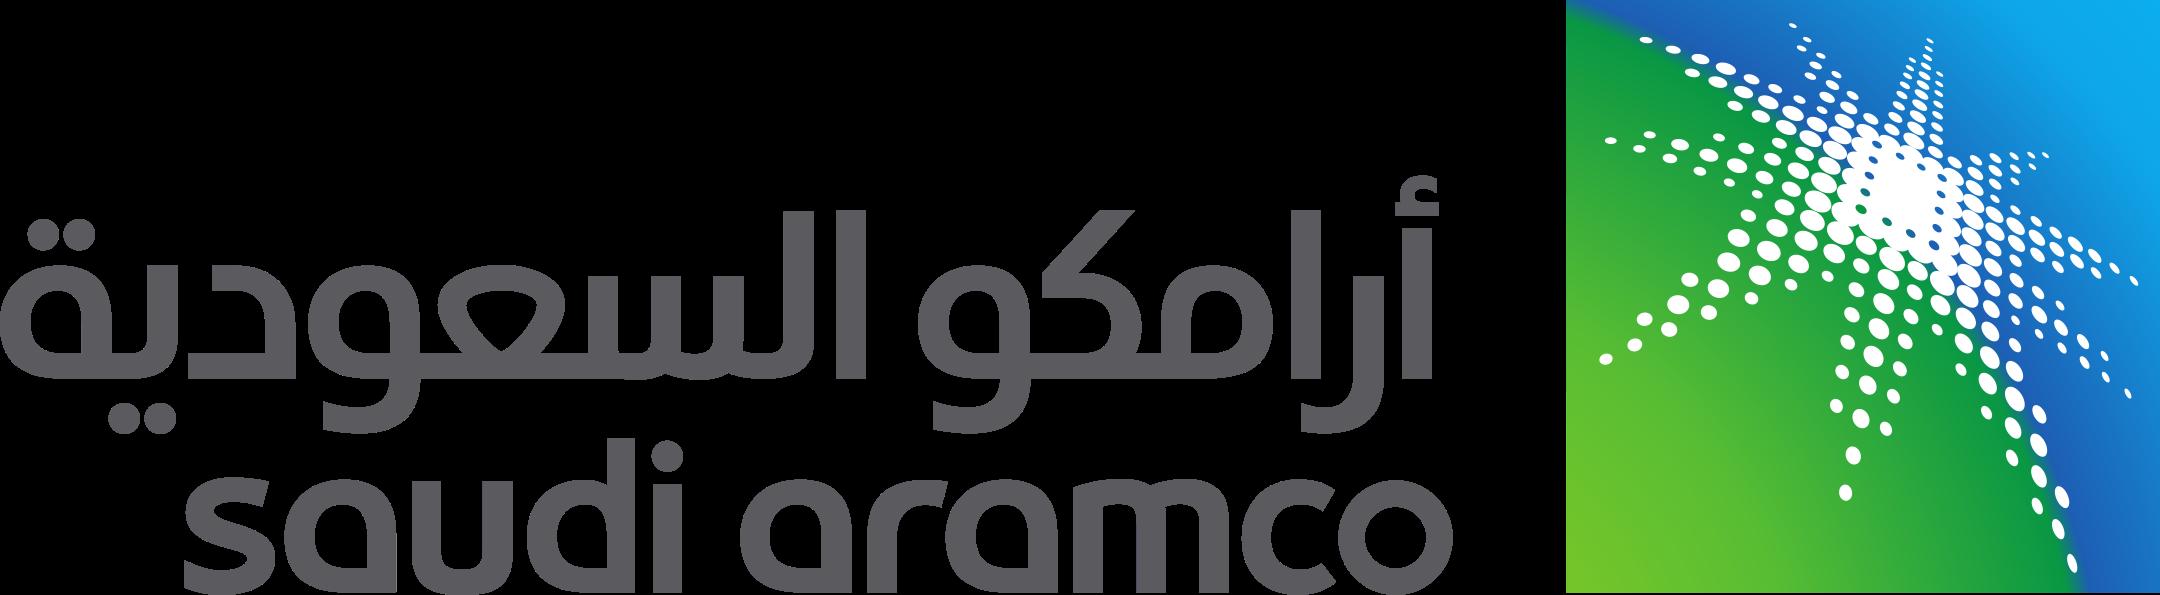 saudi aramco logo 1 - Saudi Aramco Logo